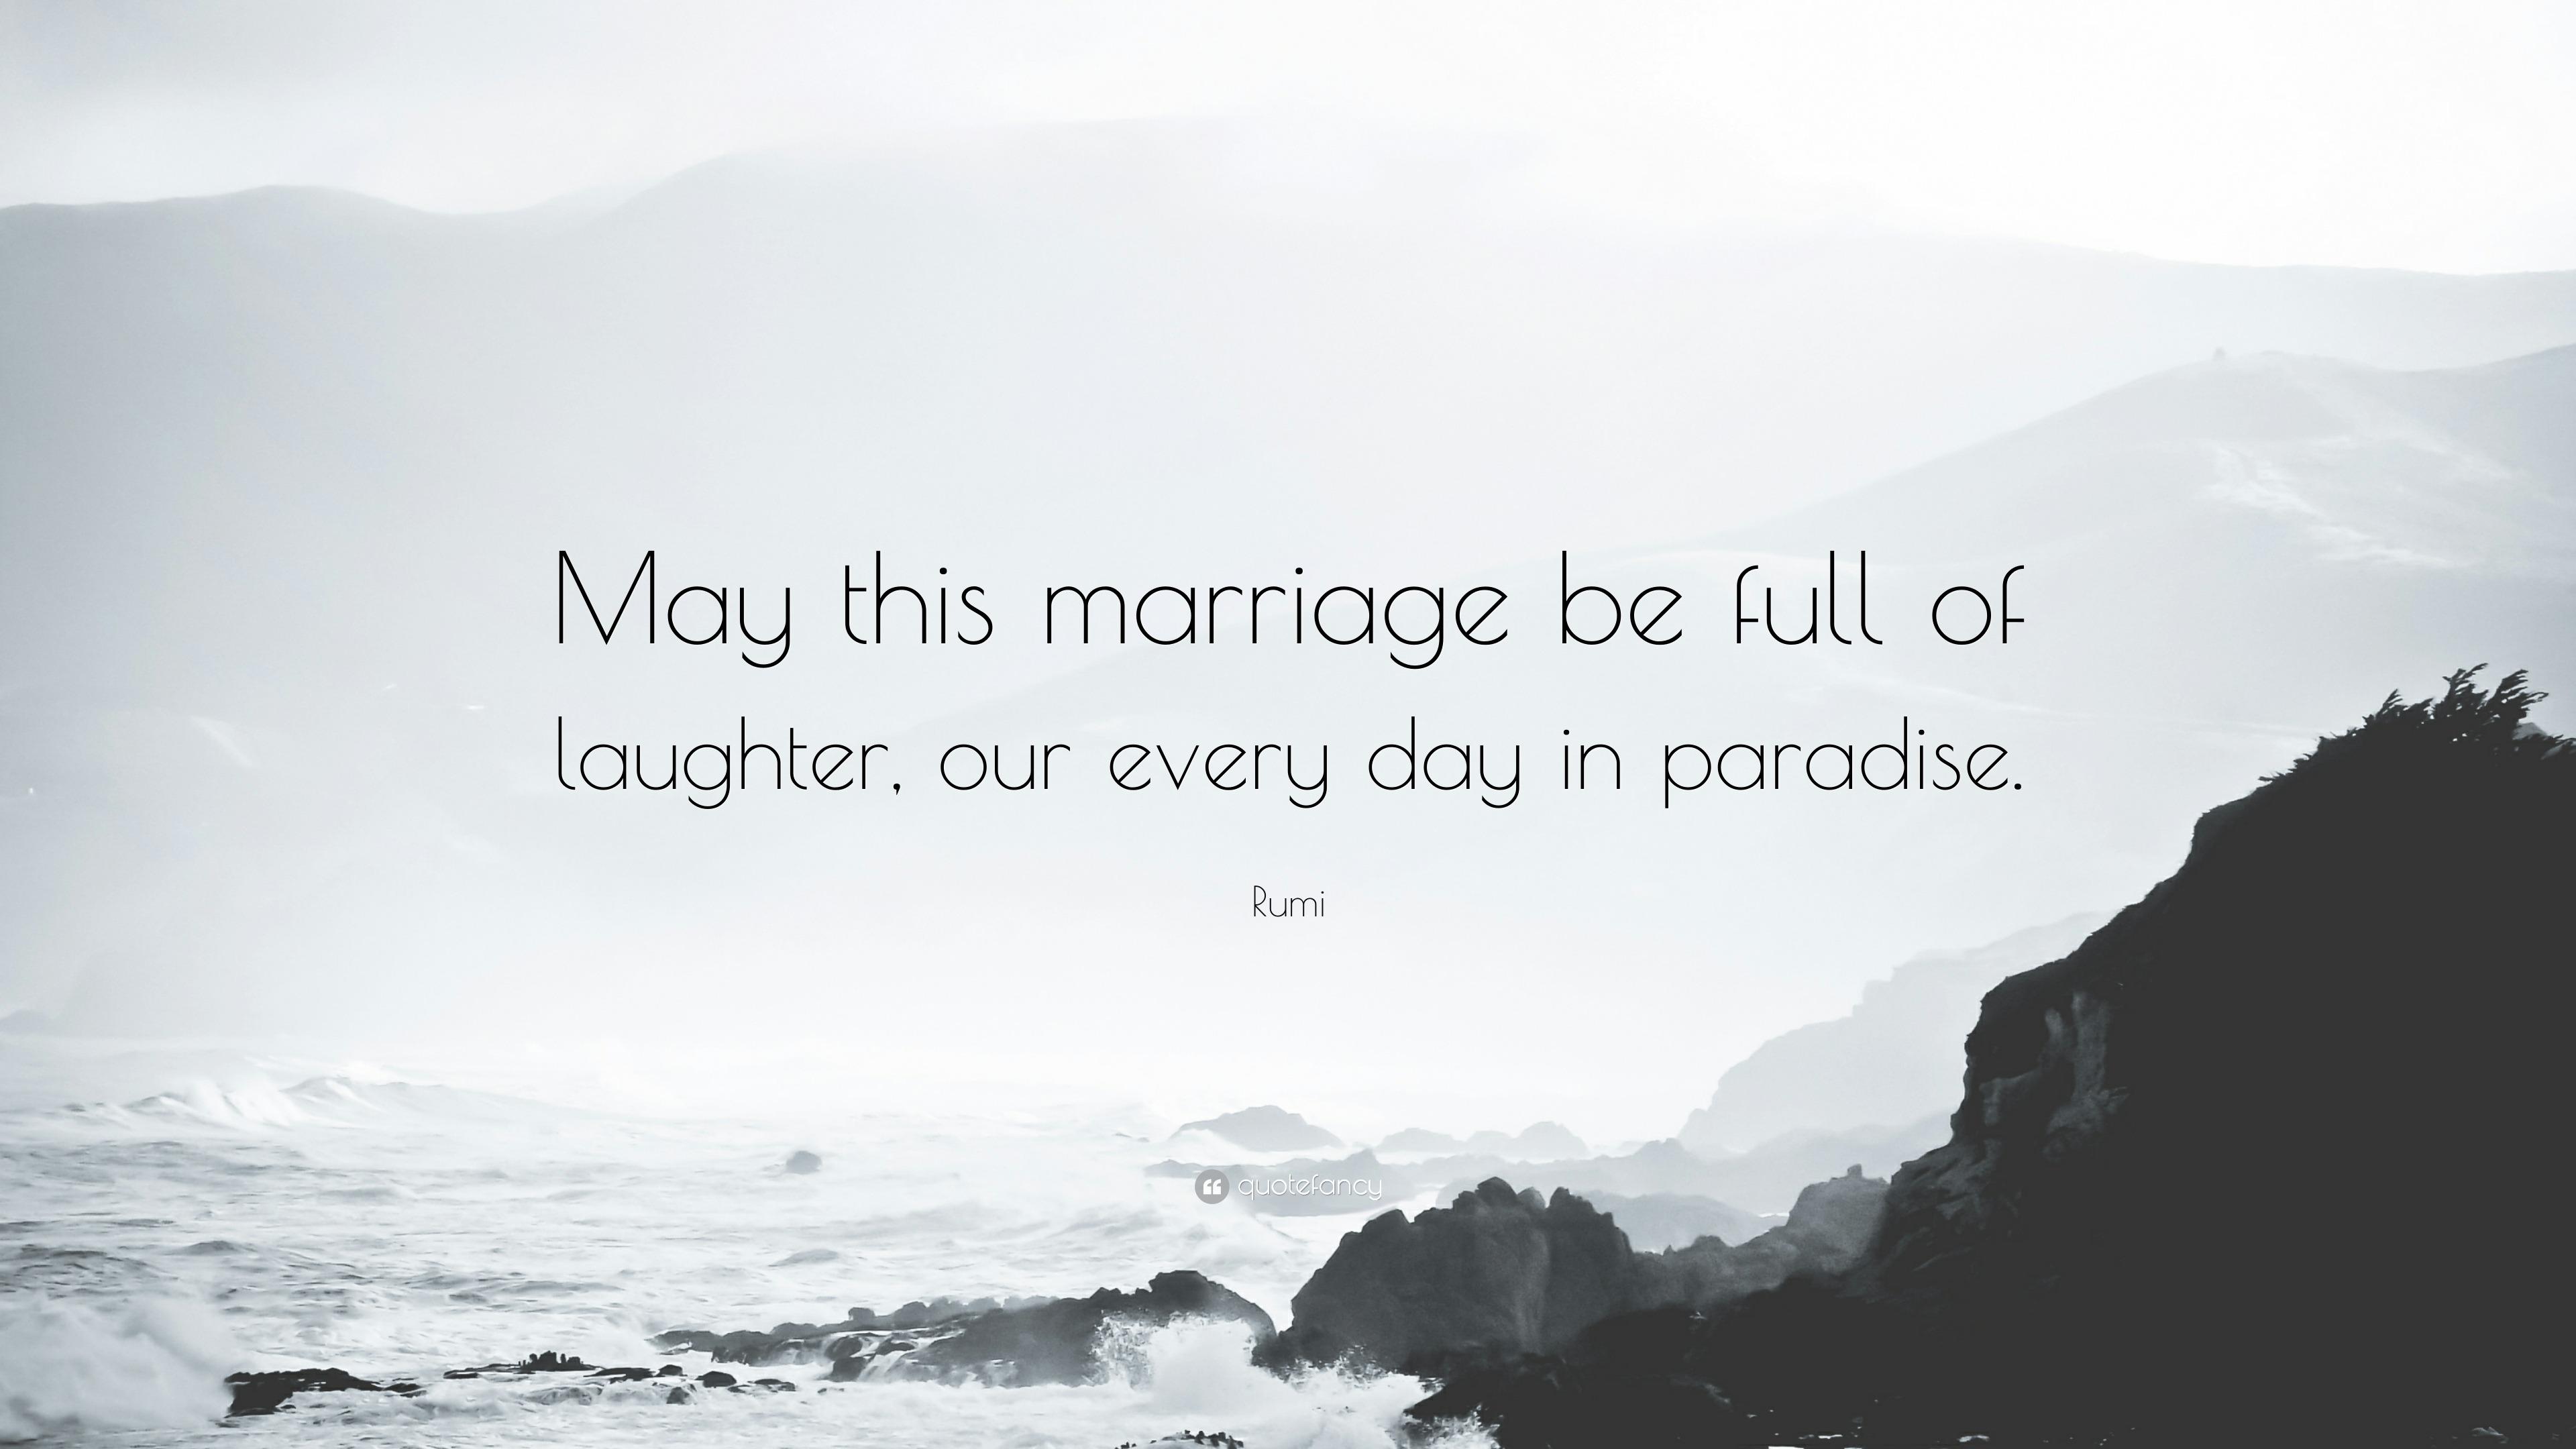 Marriage rumi